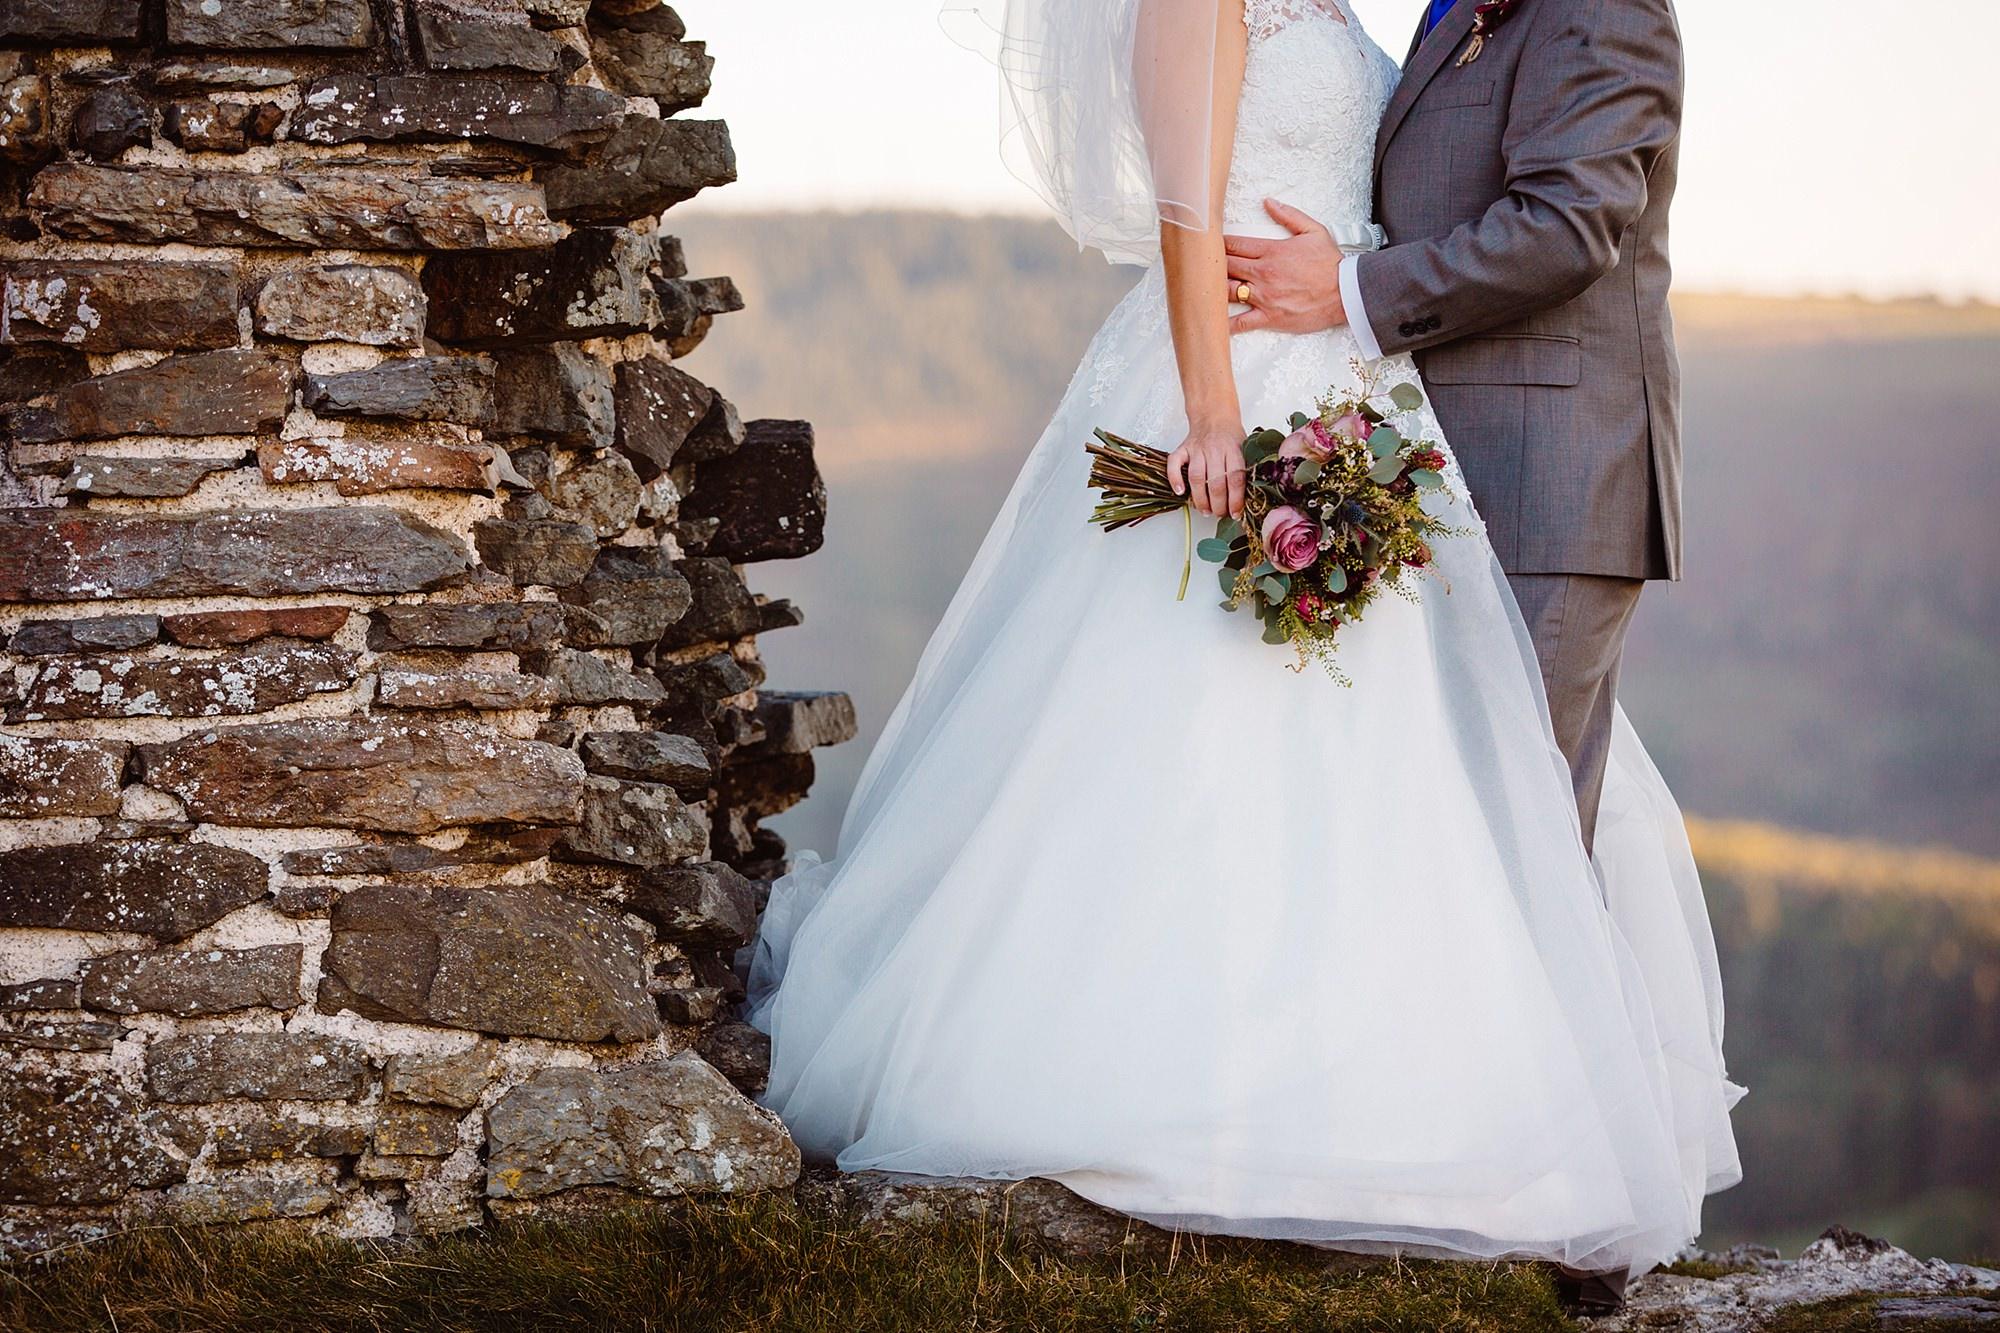 Castell dinas bran wedding photography a closeup detail of bride holding her bouquet at castell dinas bran ruins